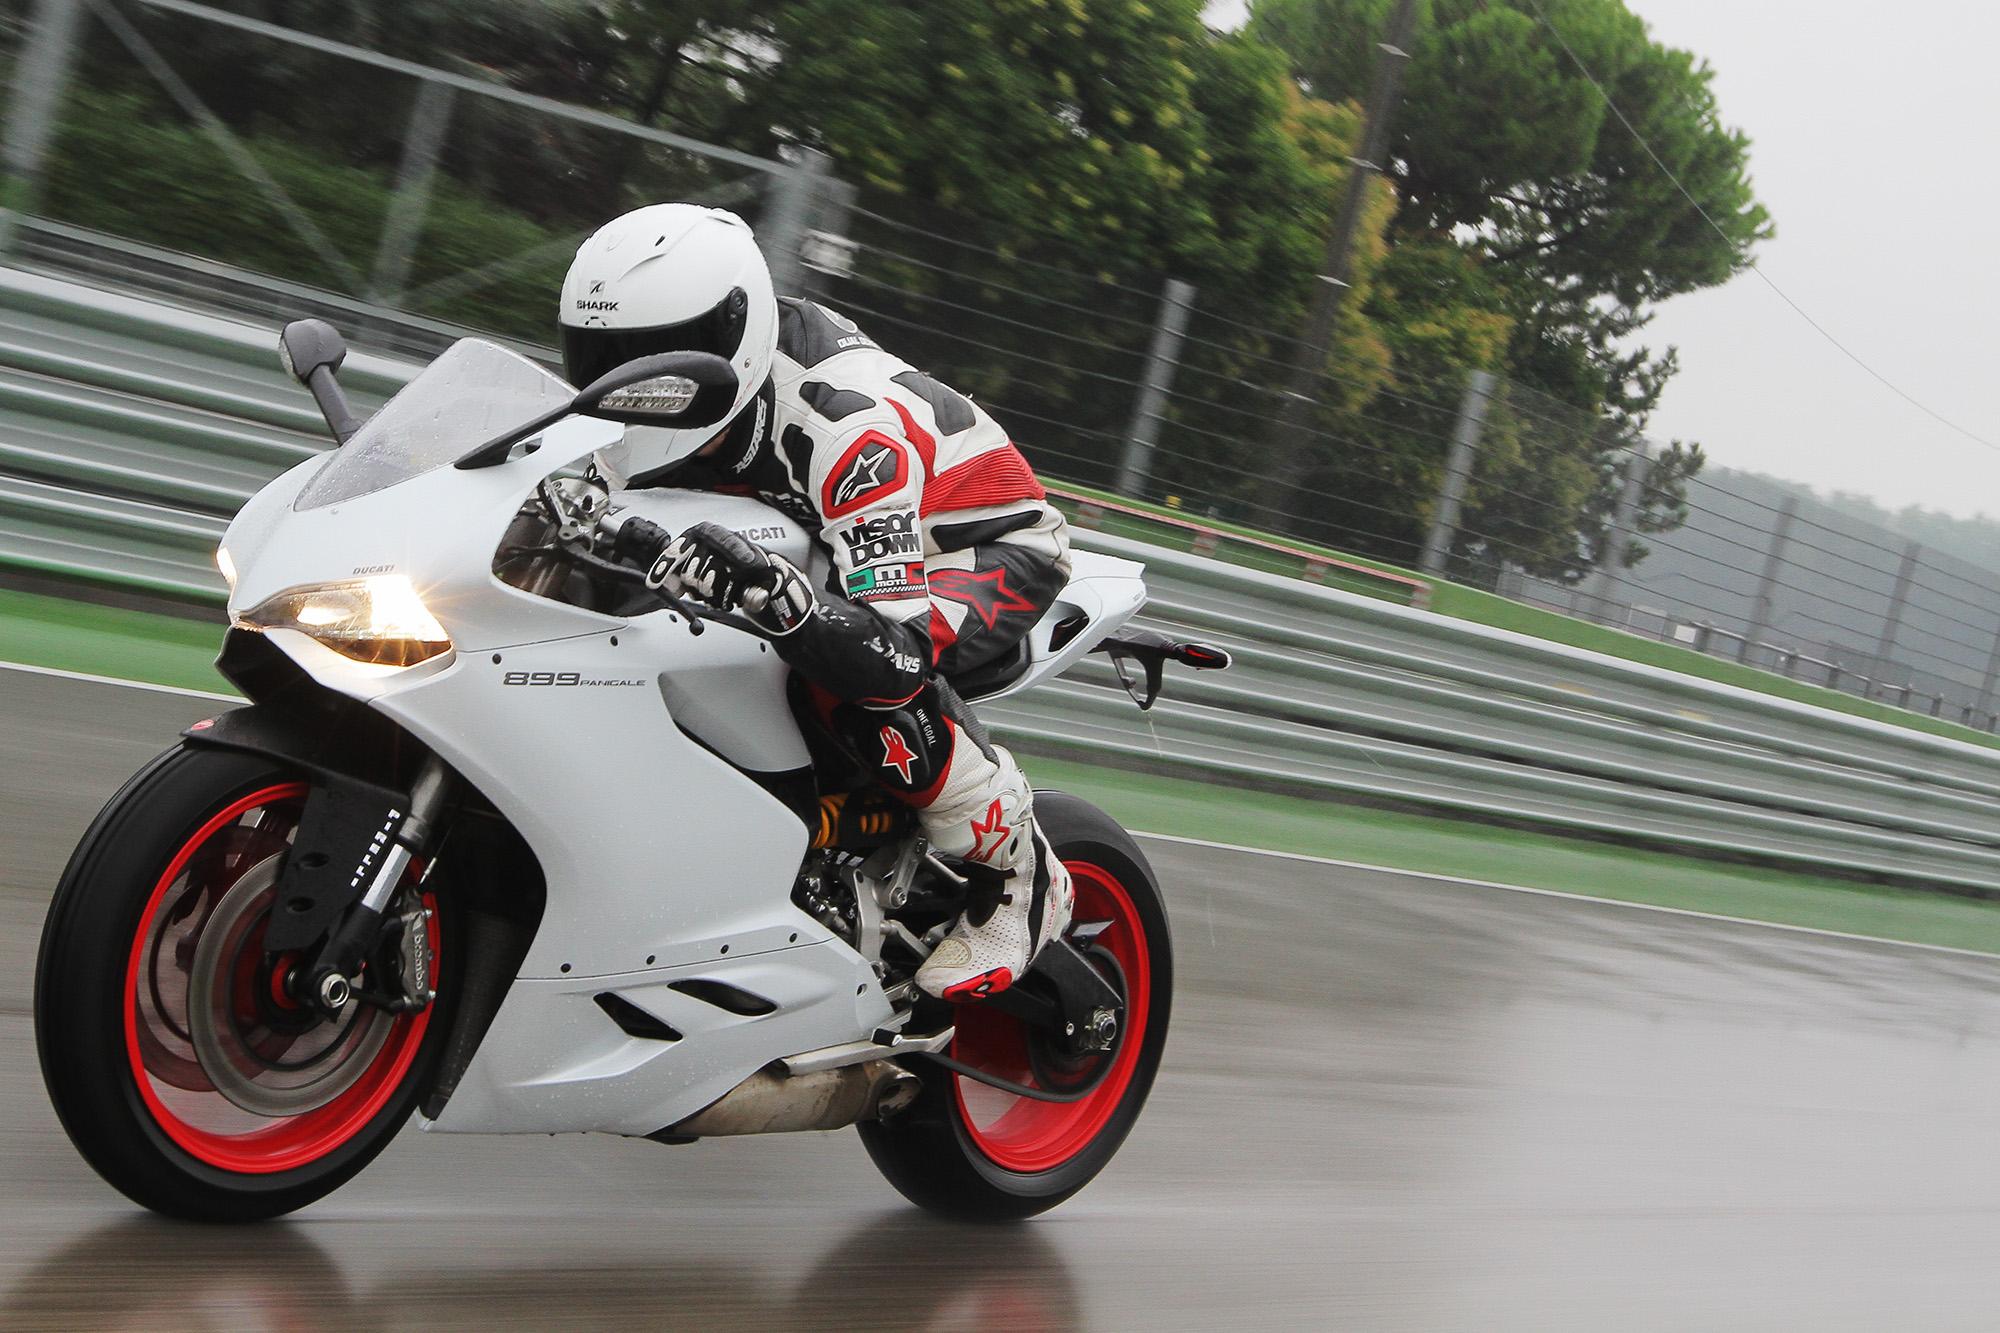 2014 Ducati 899 Panigale review | Visordown